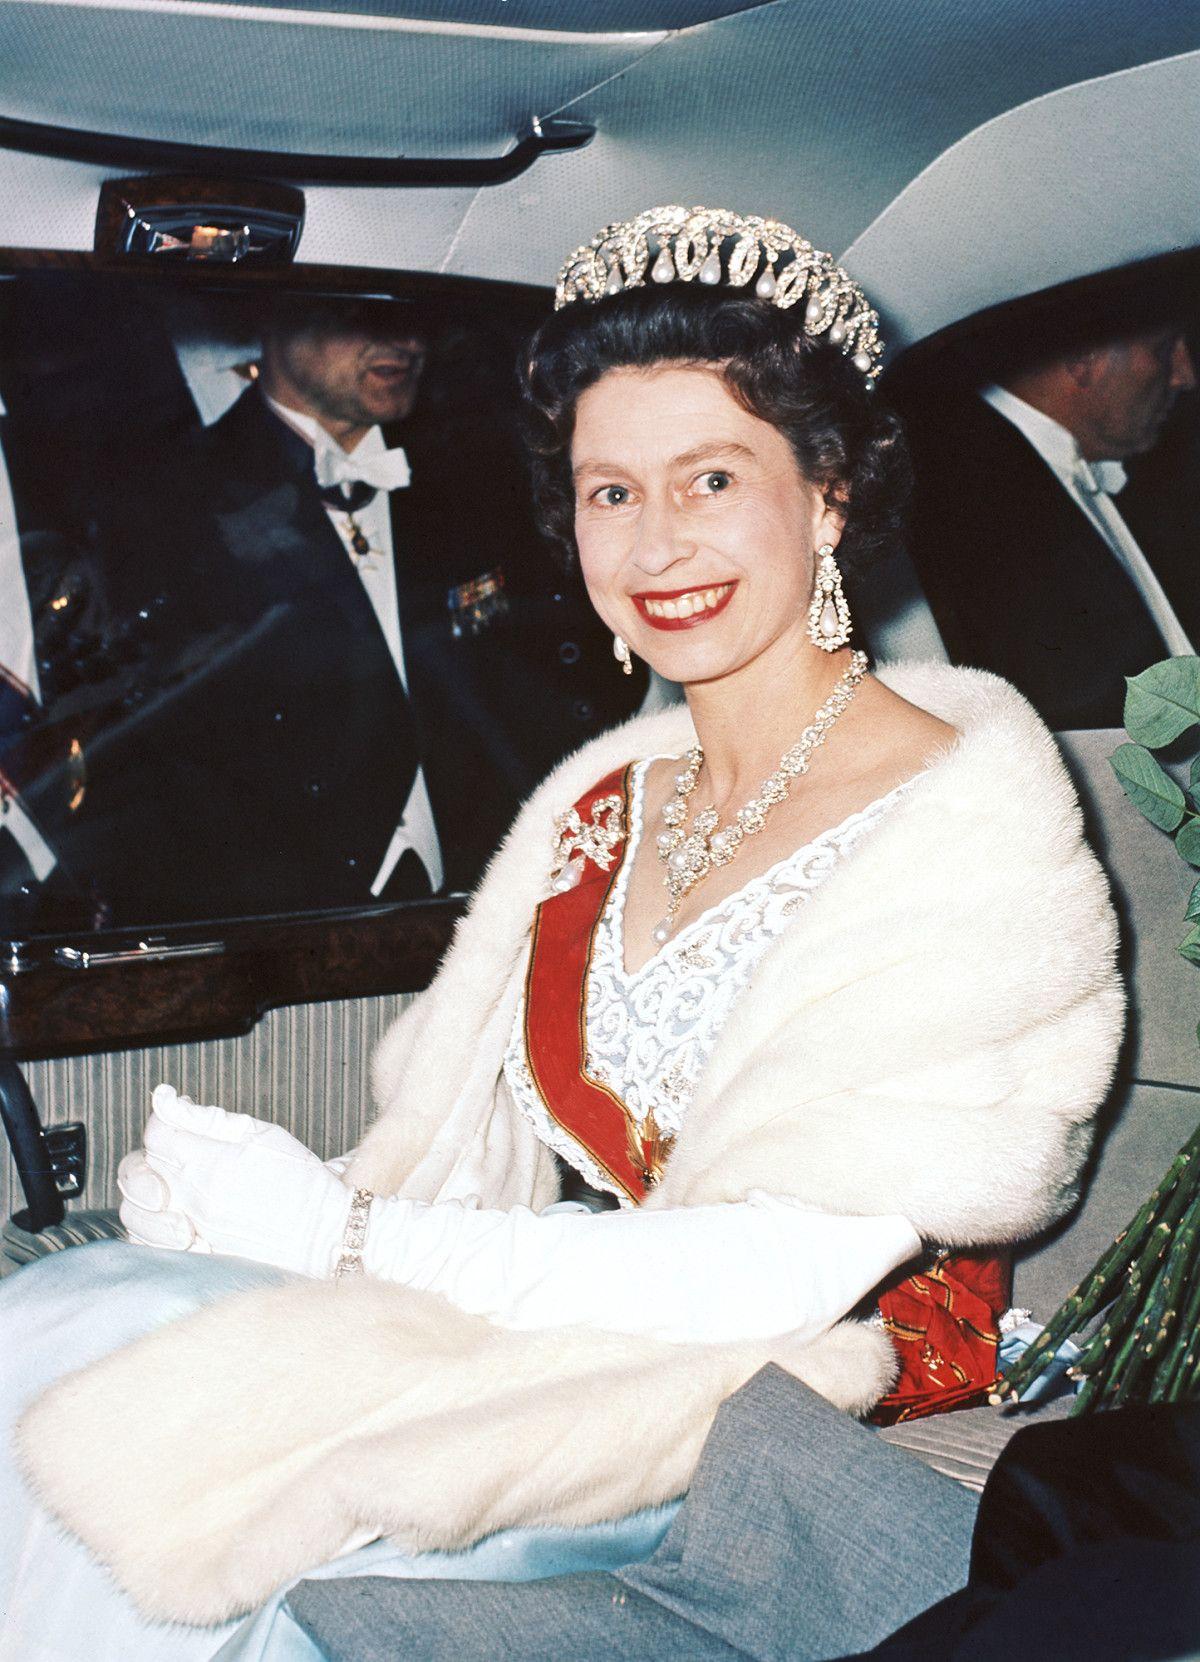 queen_elizabeth-1997cc8b-4f22-4d3d-a9c0-5ddb4cddccdc.jpg